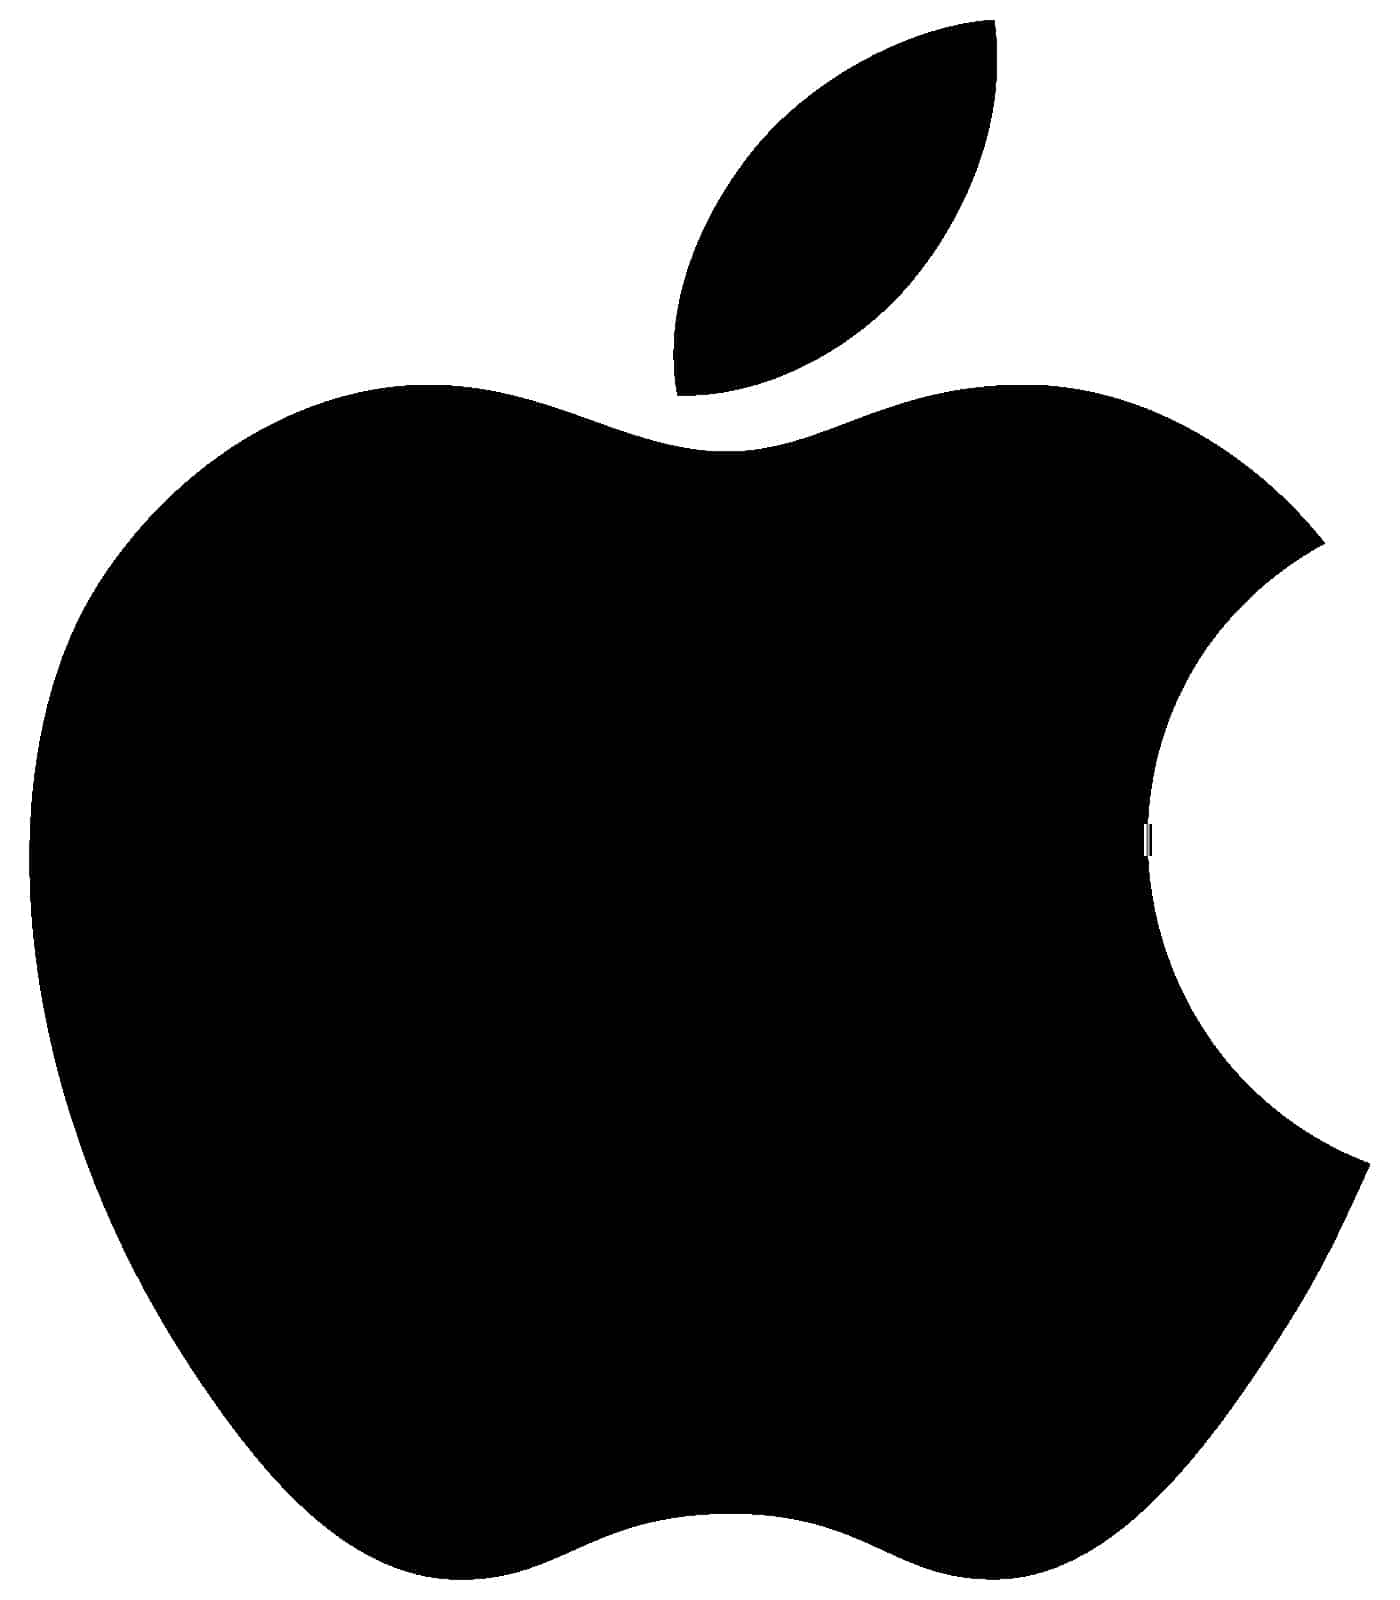 apple-logo-black - Macthai.com